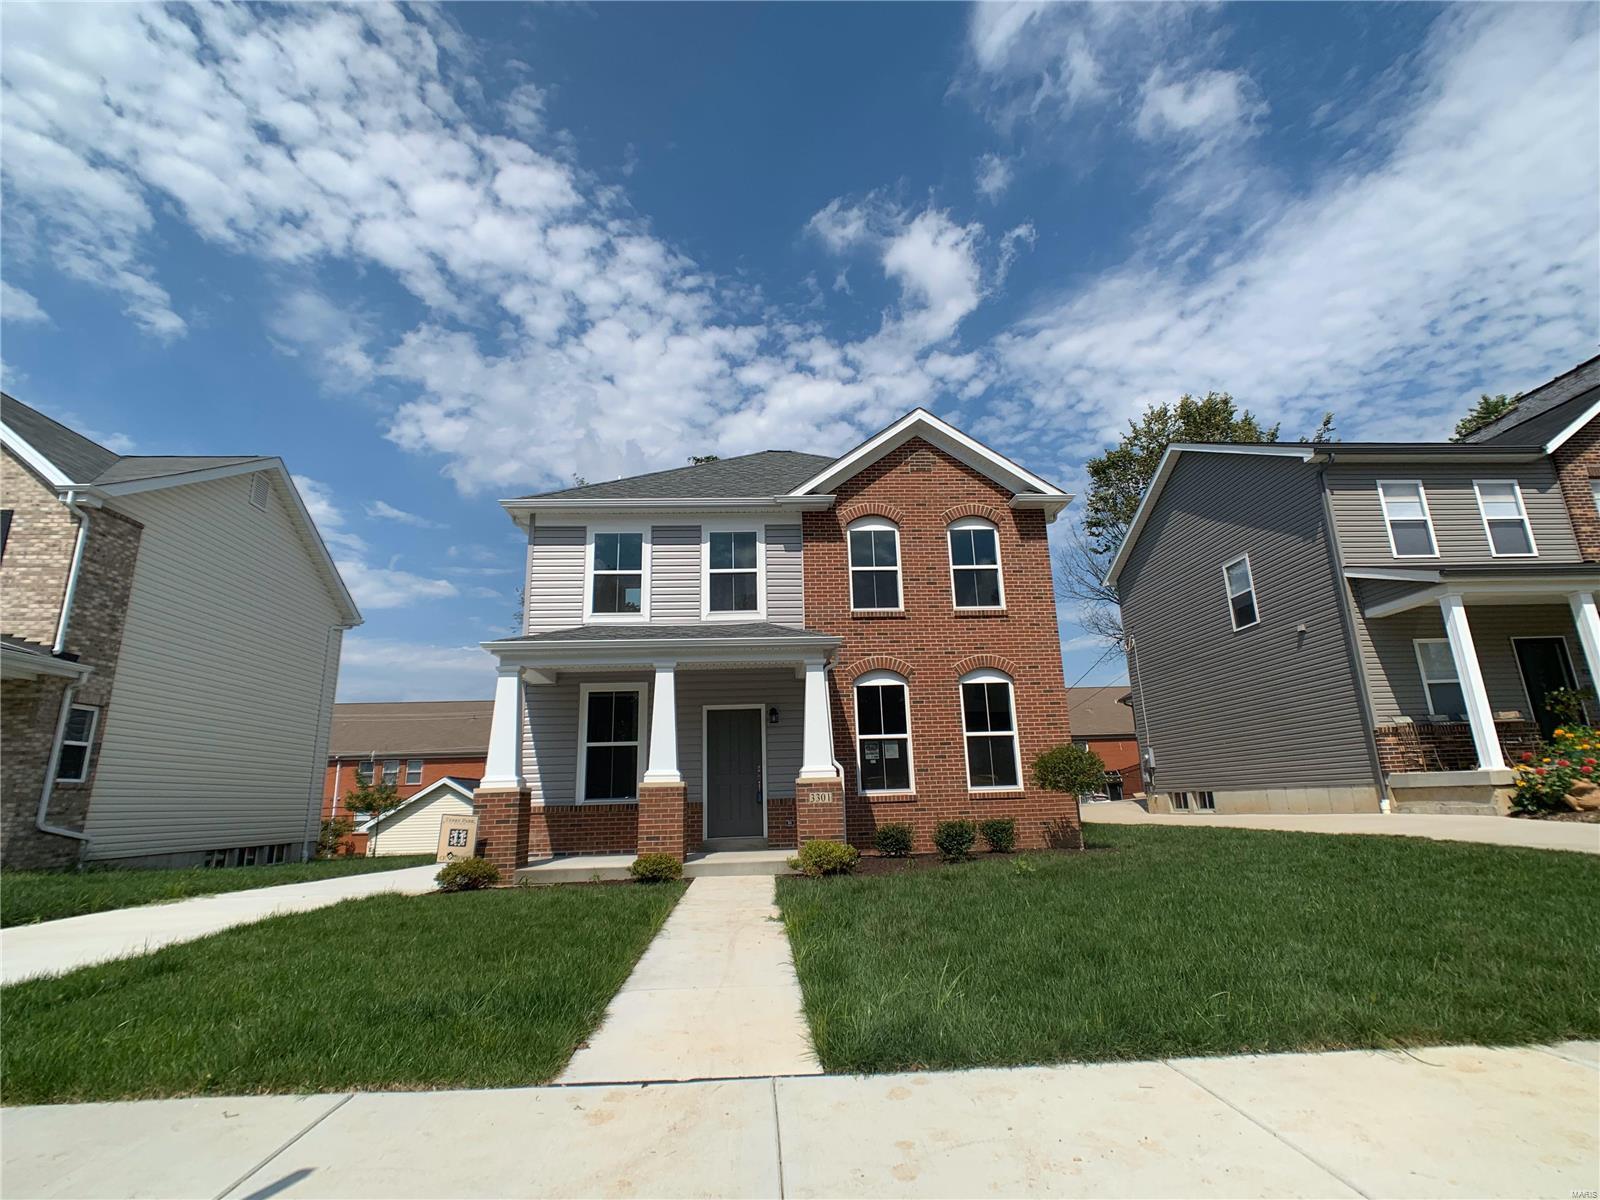 3301 Henrietta - Lot 11, St Louis, MO 63104